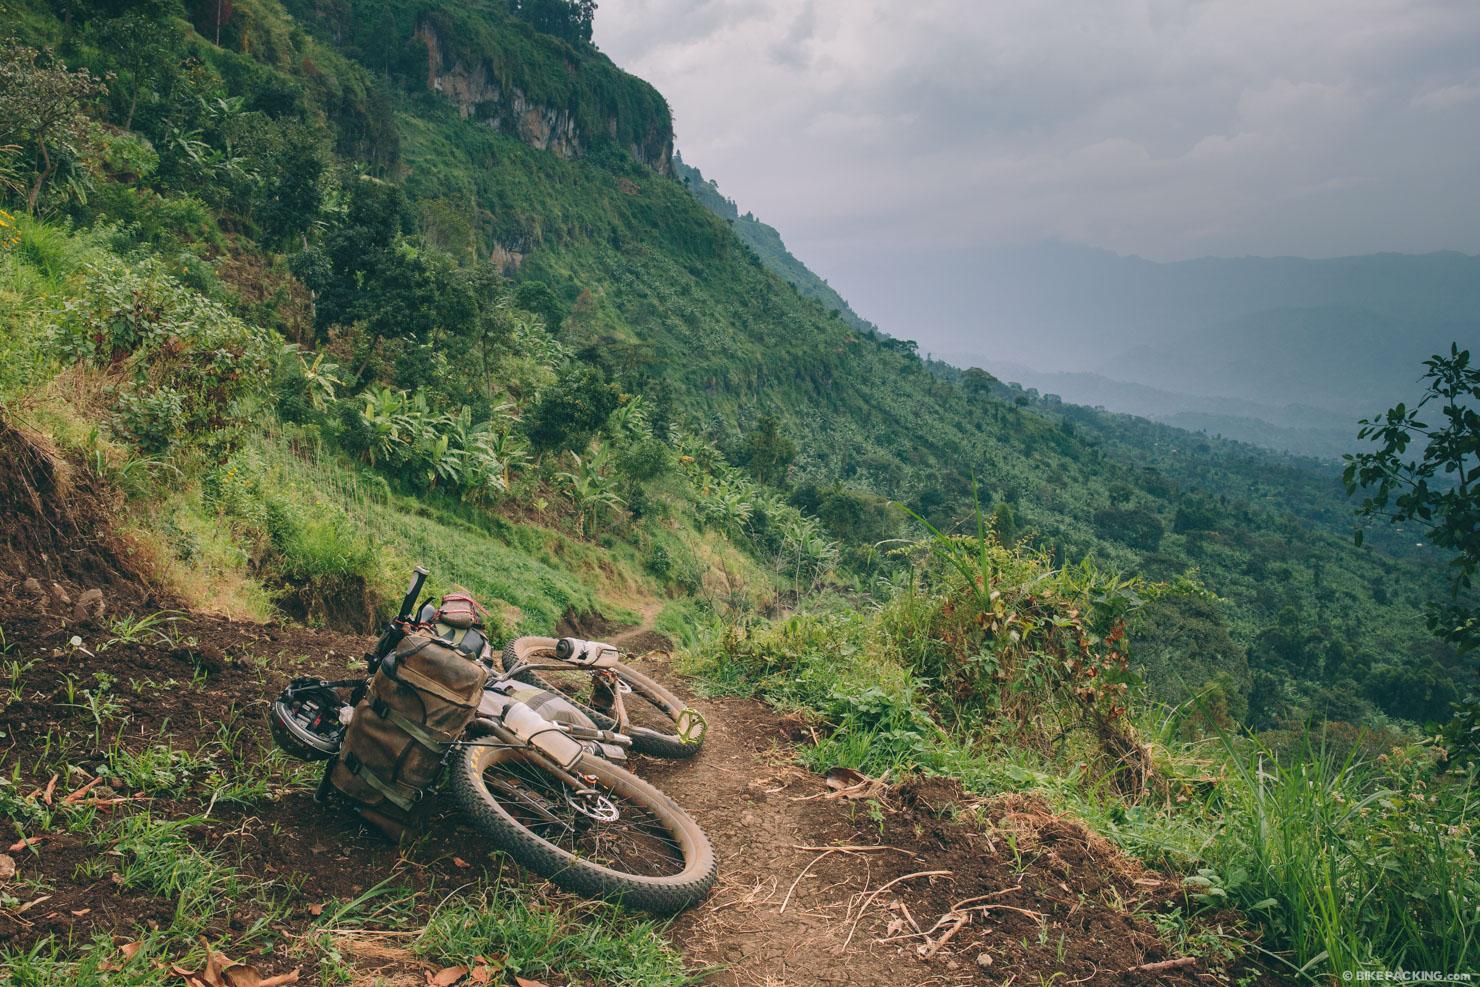 9 days bikepacking through the wilderness of Uganda